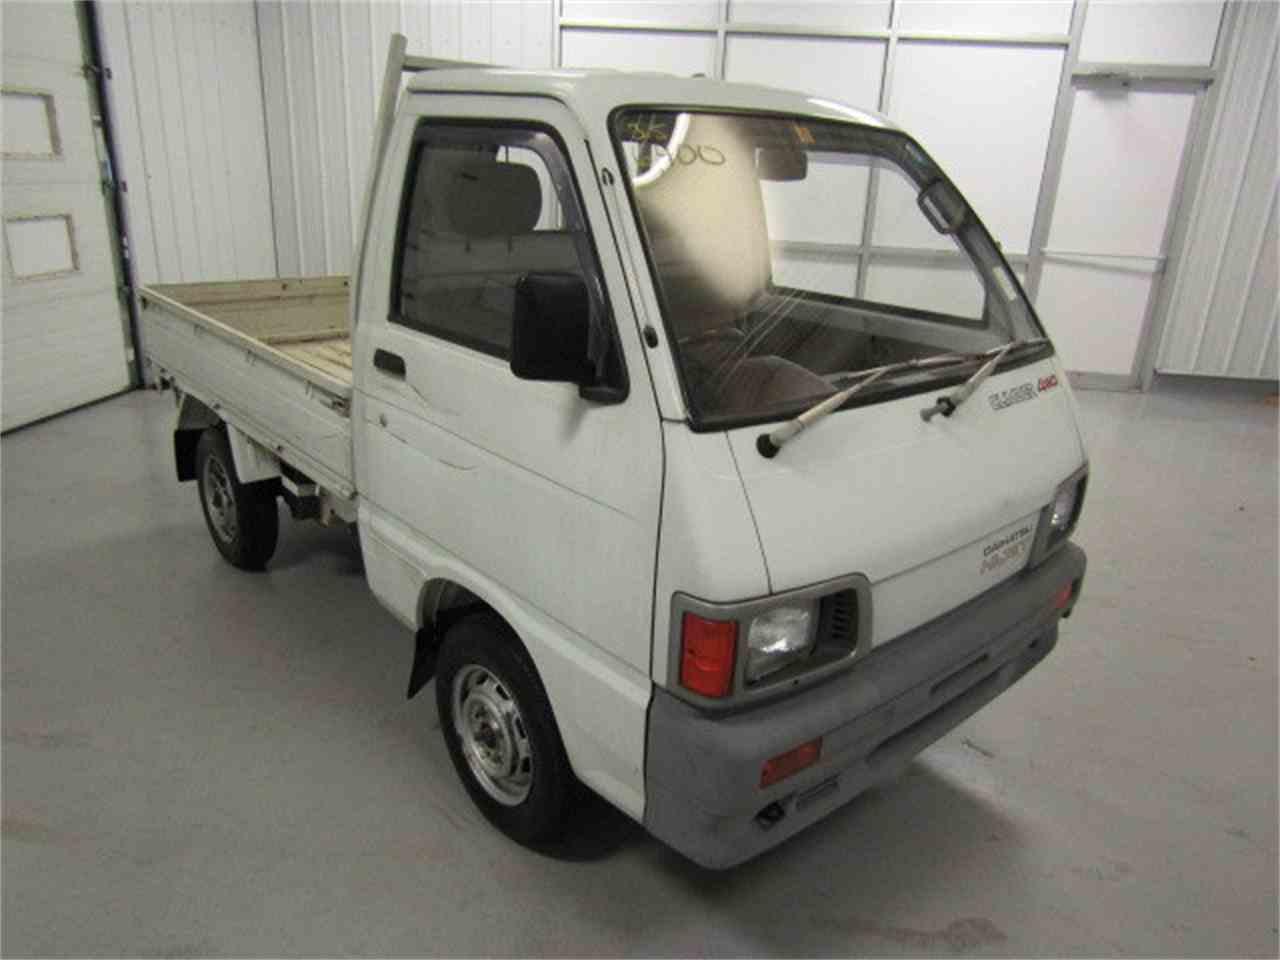 1990 Daihatsu HiJet for Sale - CC-995854